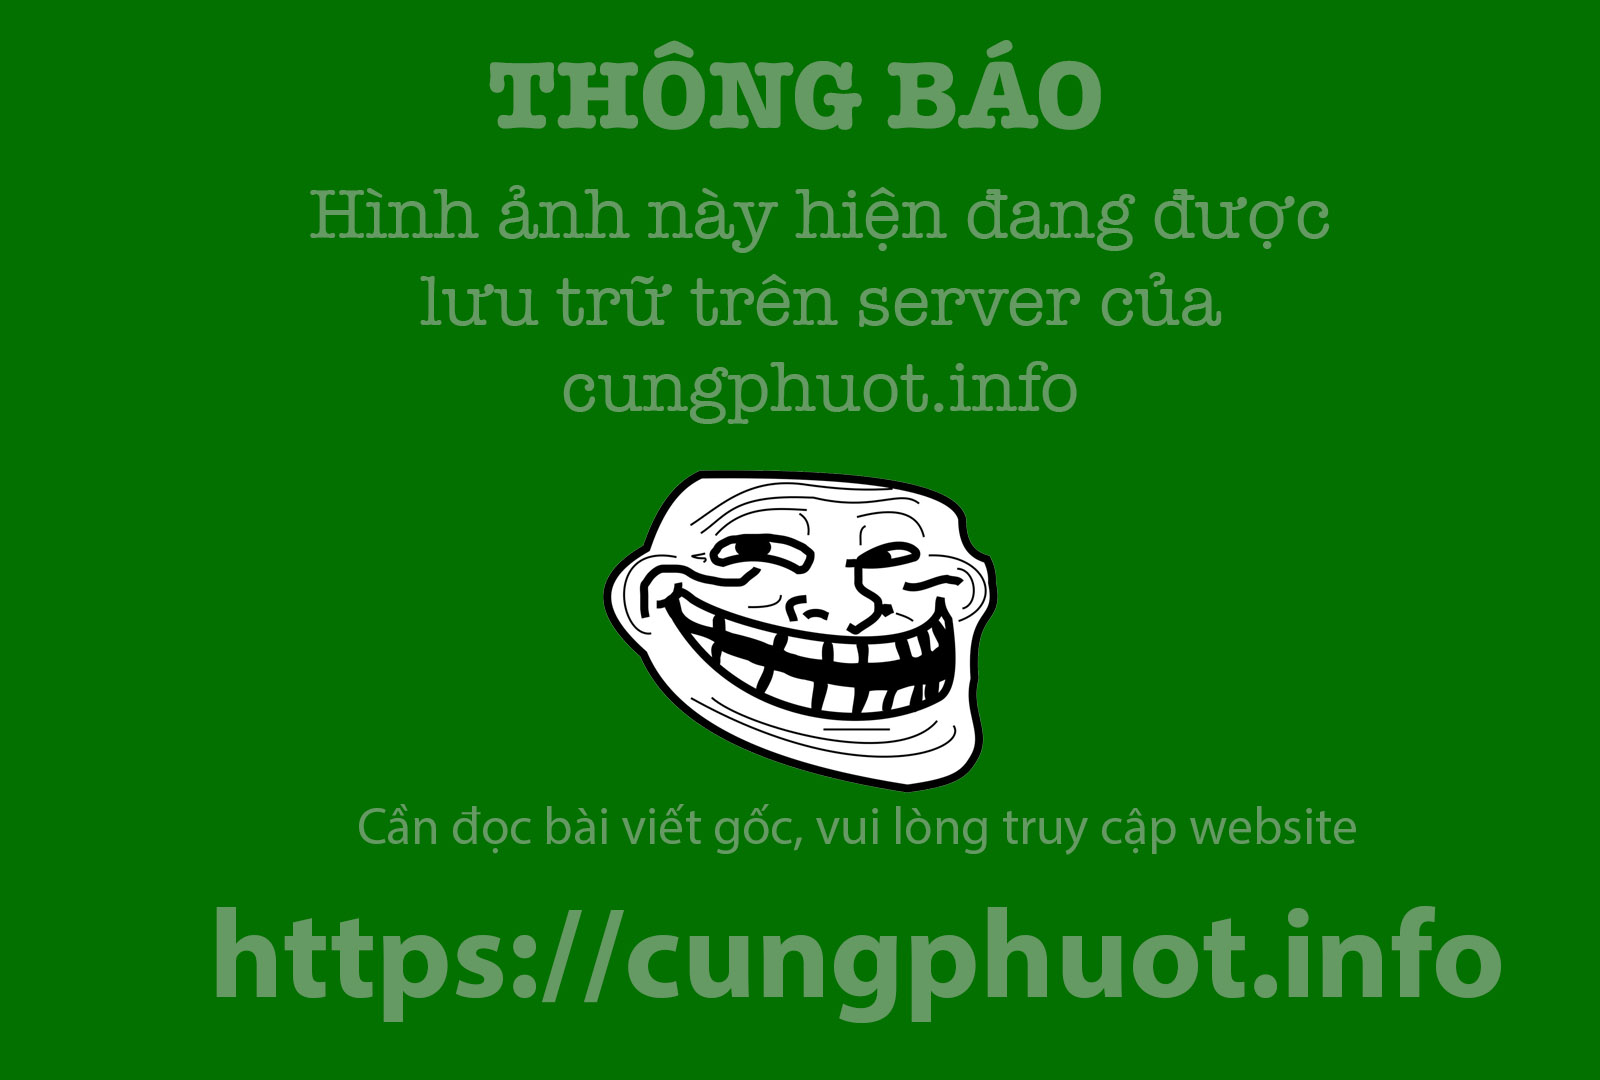 Den Moc Chau san mai anh dao hinh anh 8